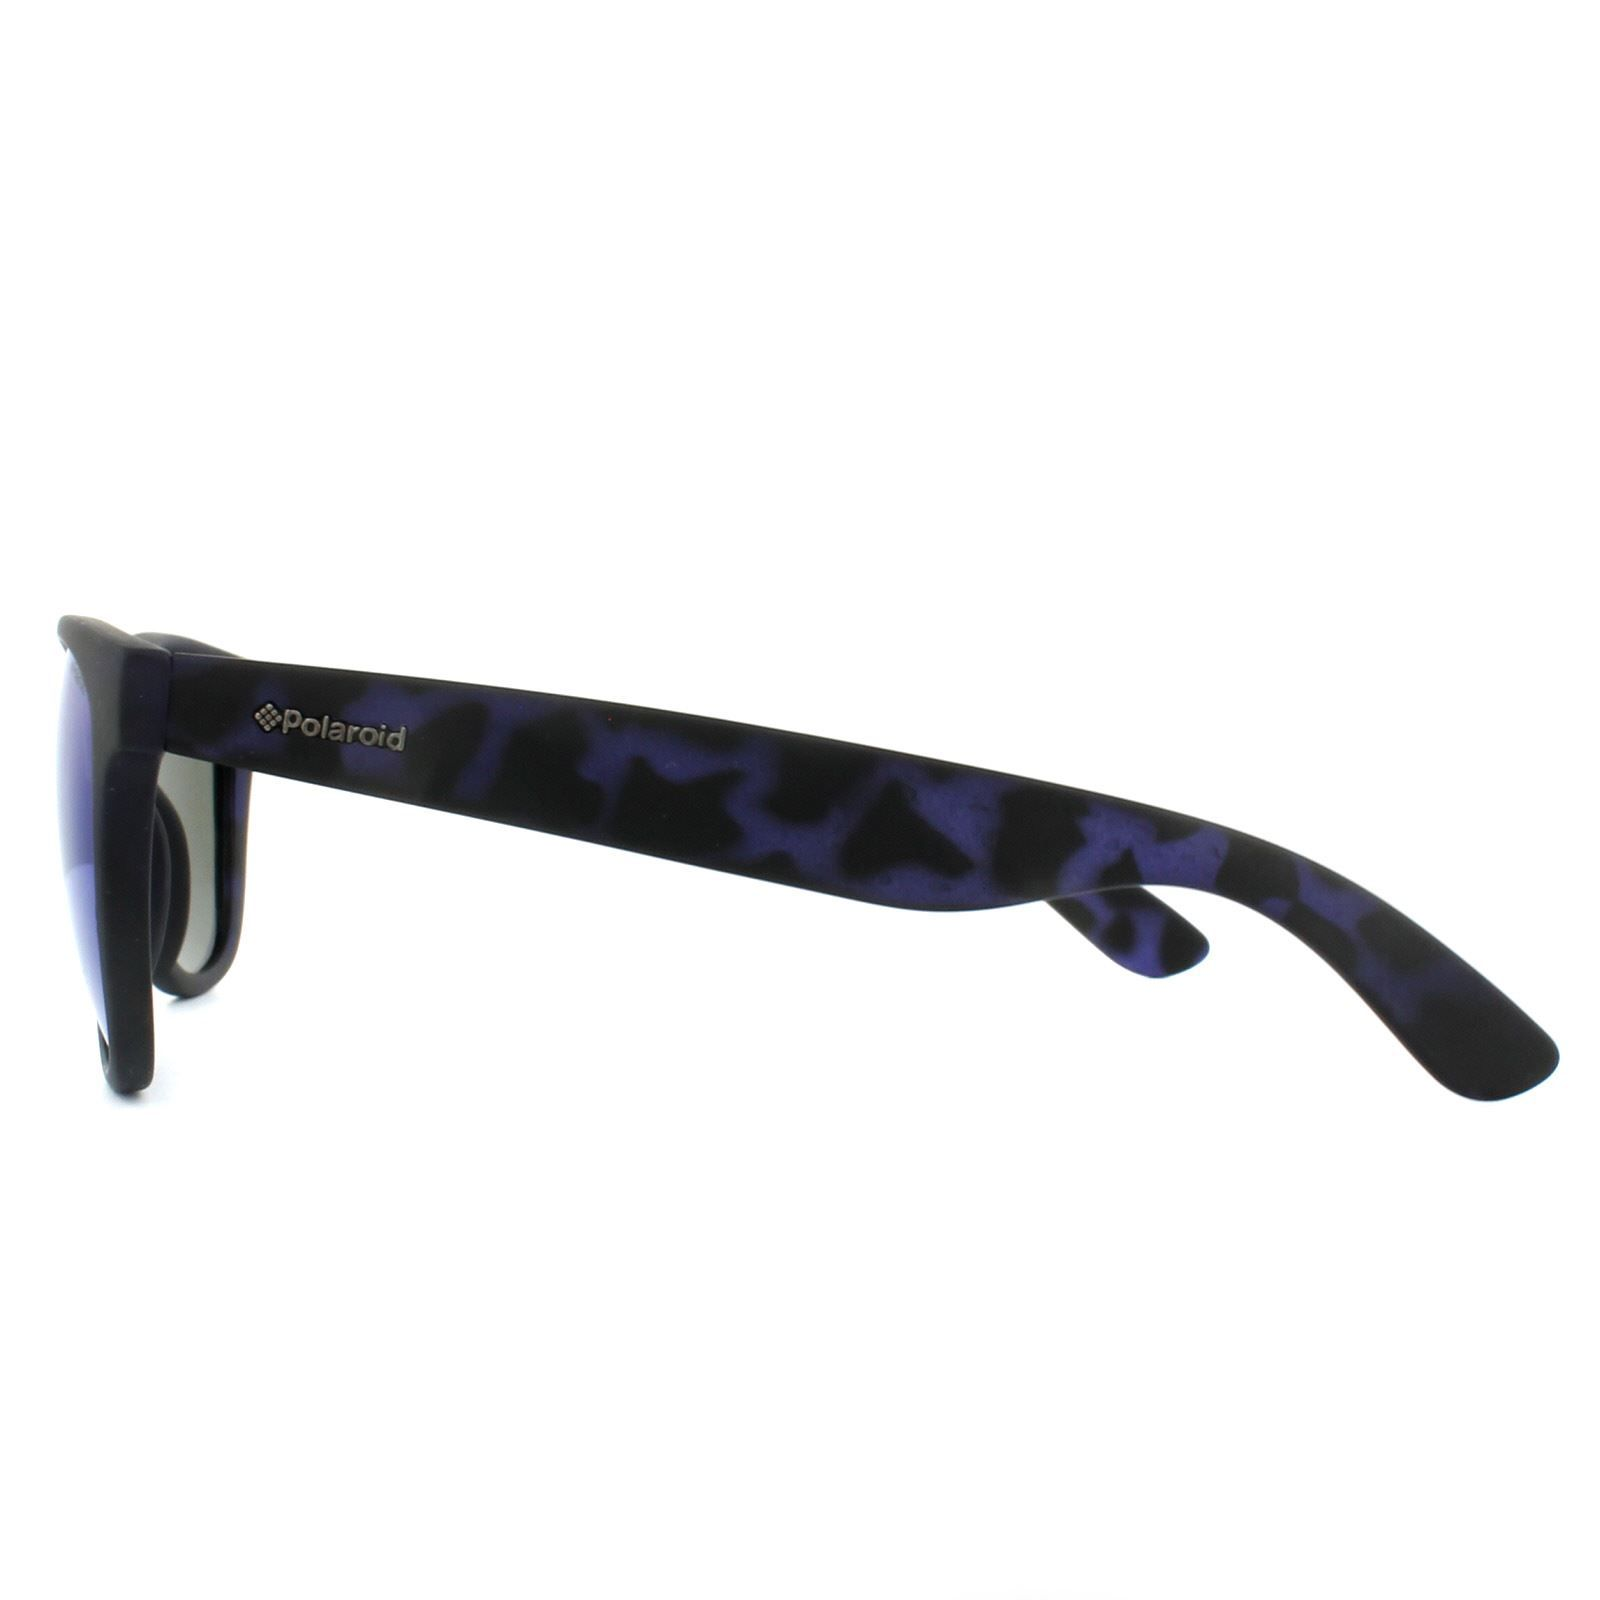 Polaroid Sunglasses P8443 FLL JY Matt Blue Pattern Blue Mirror Polarized